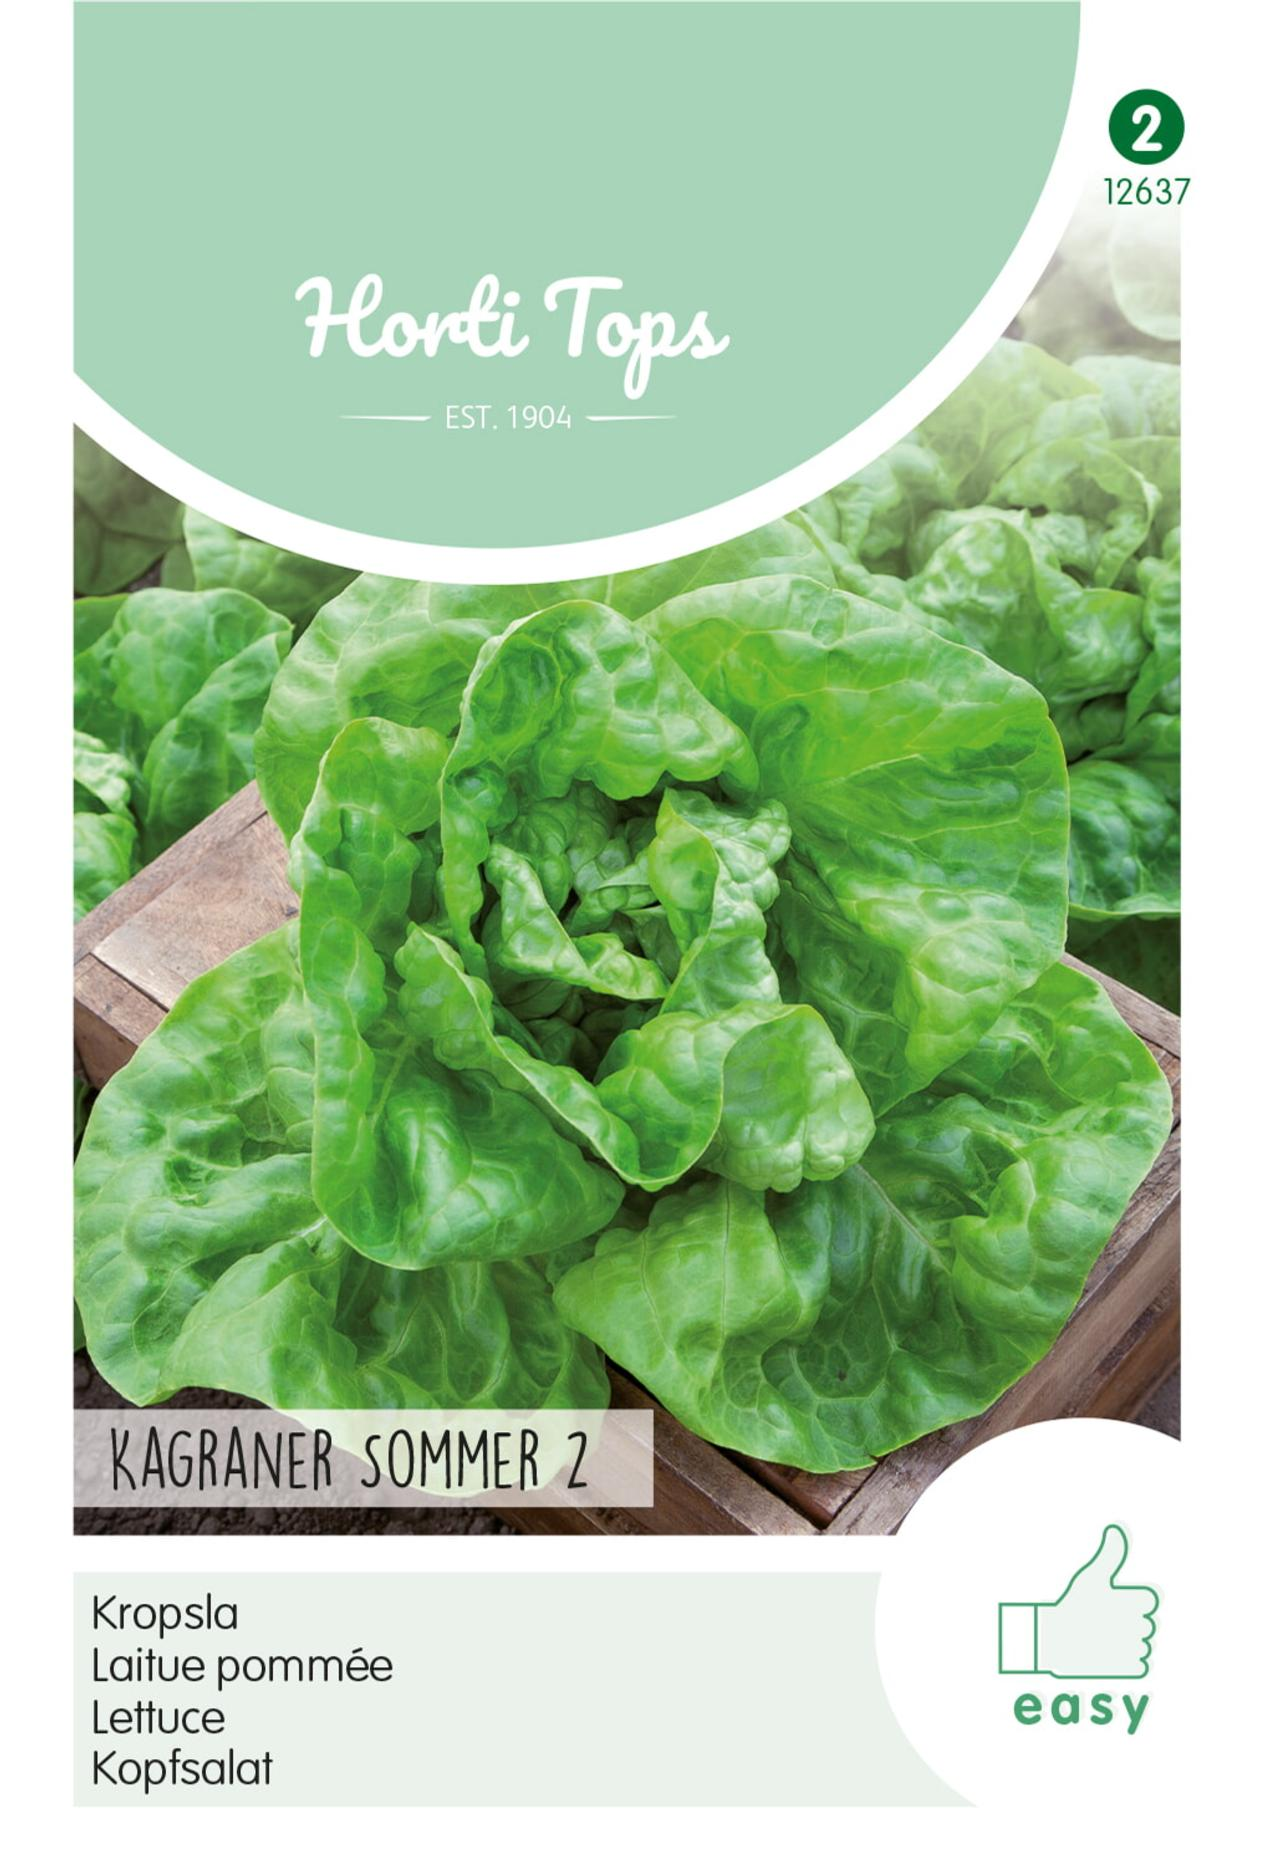 Lactuca sativa 'Kagraner Sommer 2' plant